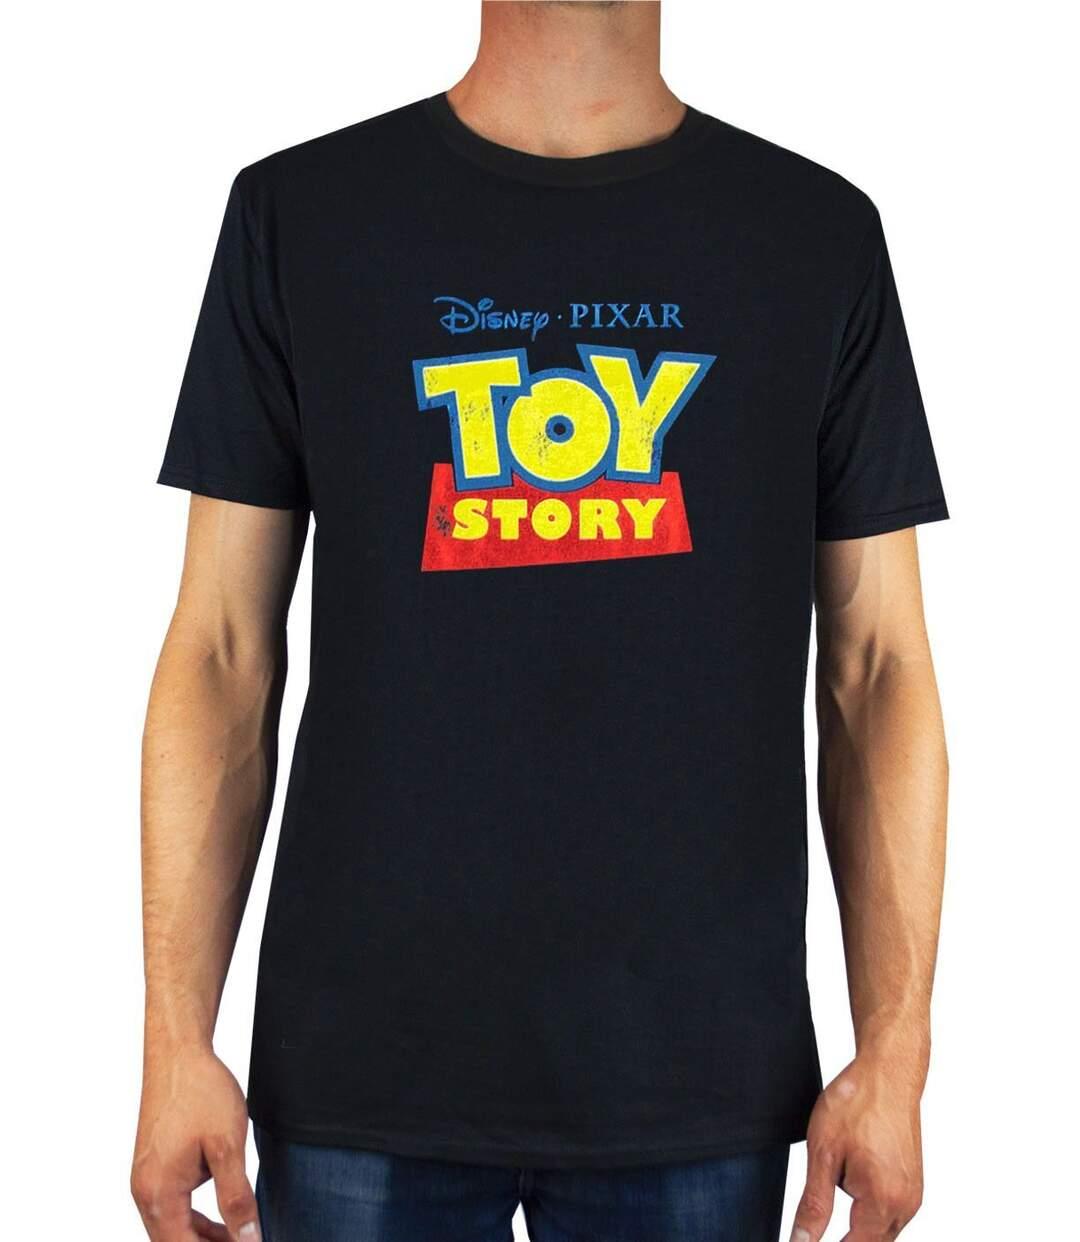 Toy Story Mens Distressed Logo T-Shirt (Black) - UTNS5599